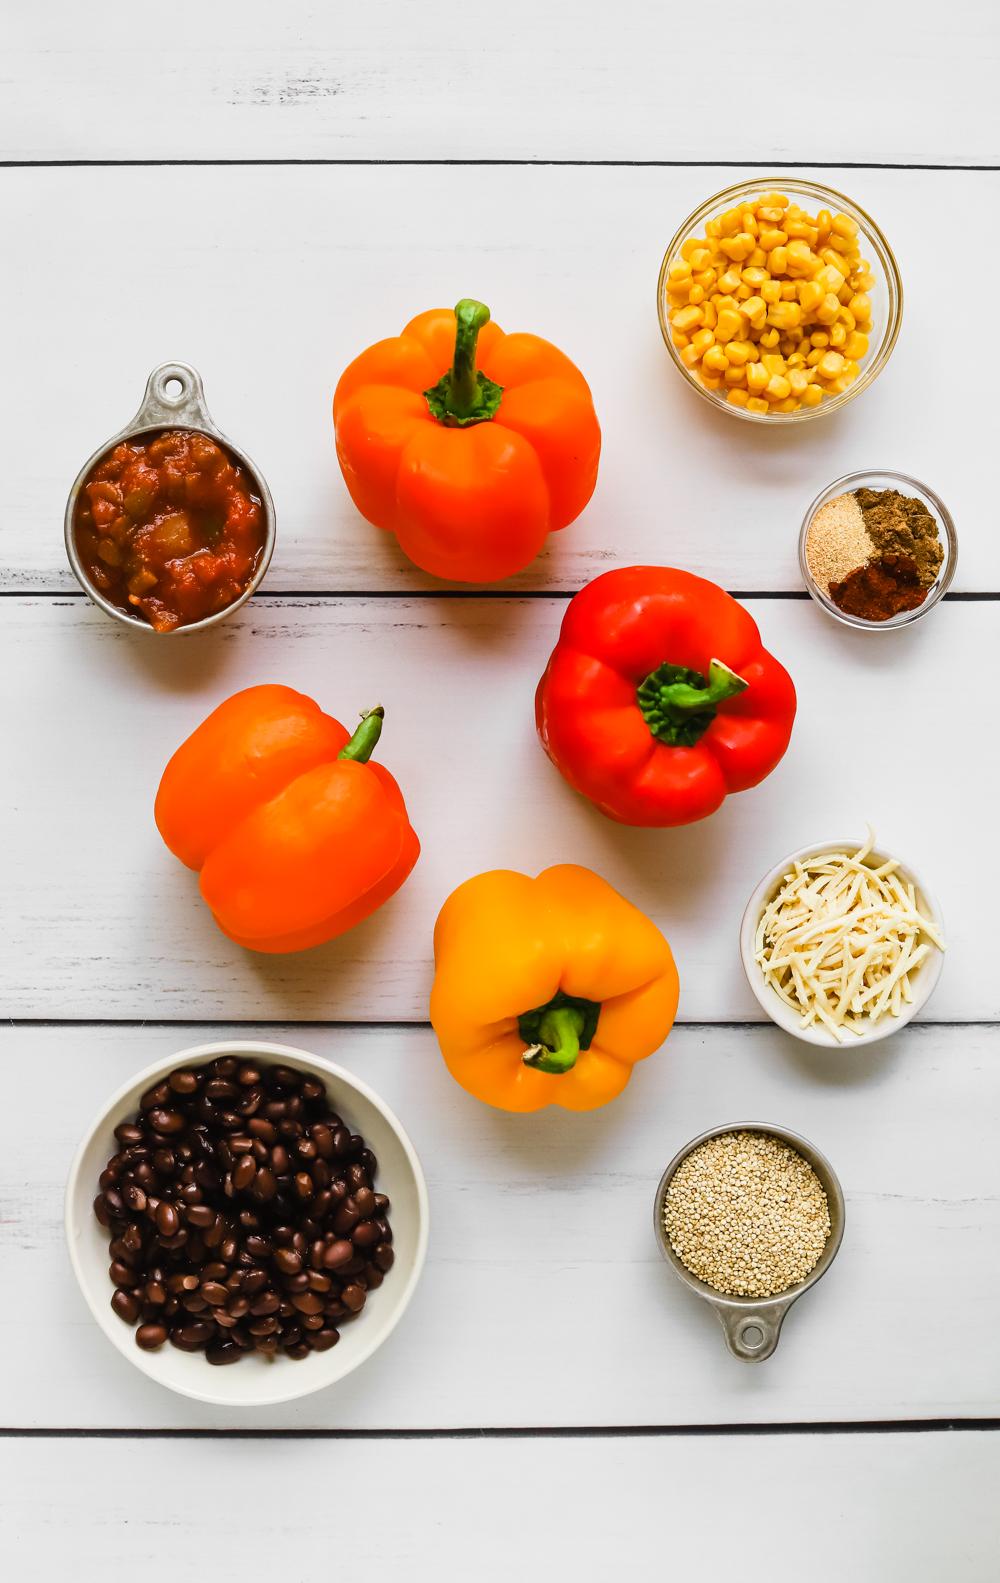 Ingredients to make vegan stuffed bell pepper jack o'lanterns: bell peppers, salsa, corn, black beans, quinoa, vegan mozzarella cheese, cumin, chili powder, garlic powder, and salt.